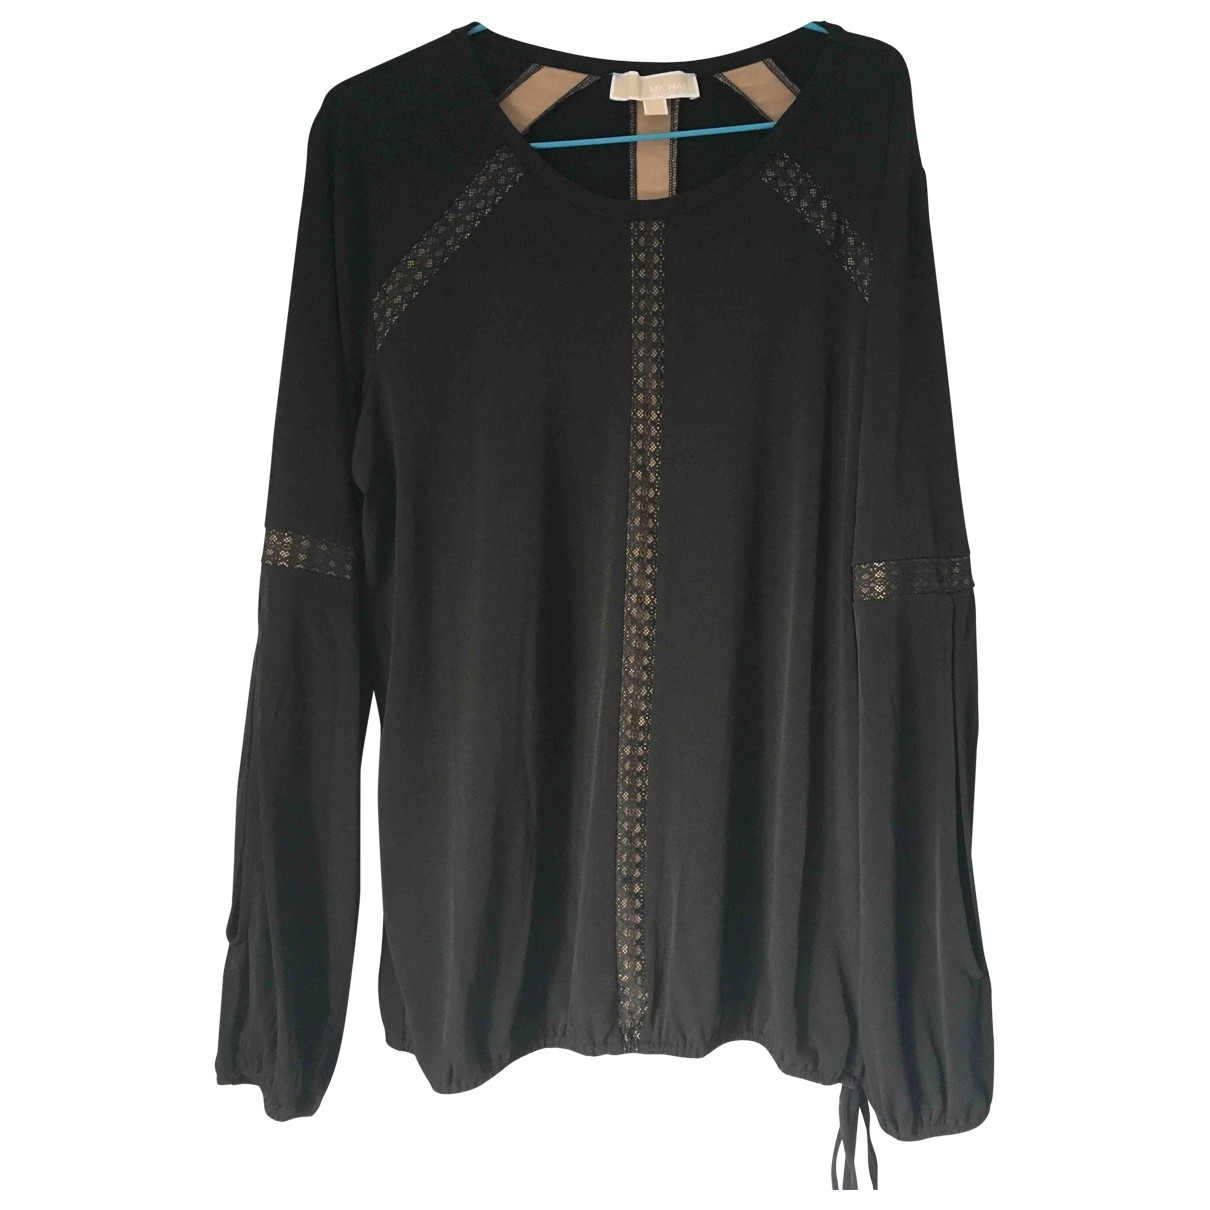 Michael Kors \N Black  top for Women L International